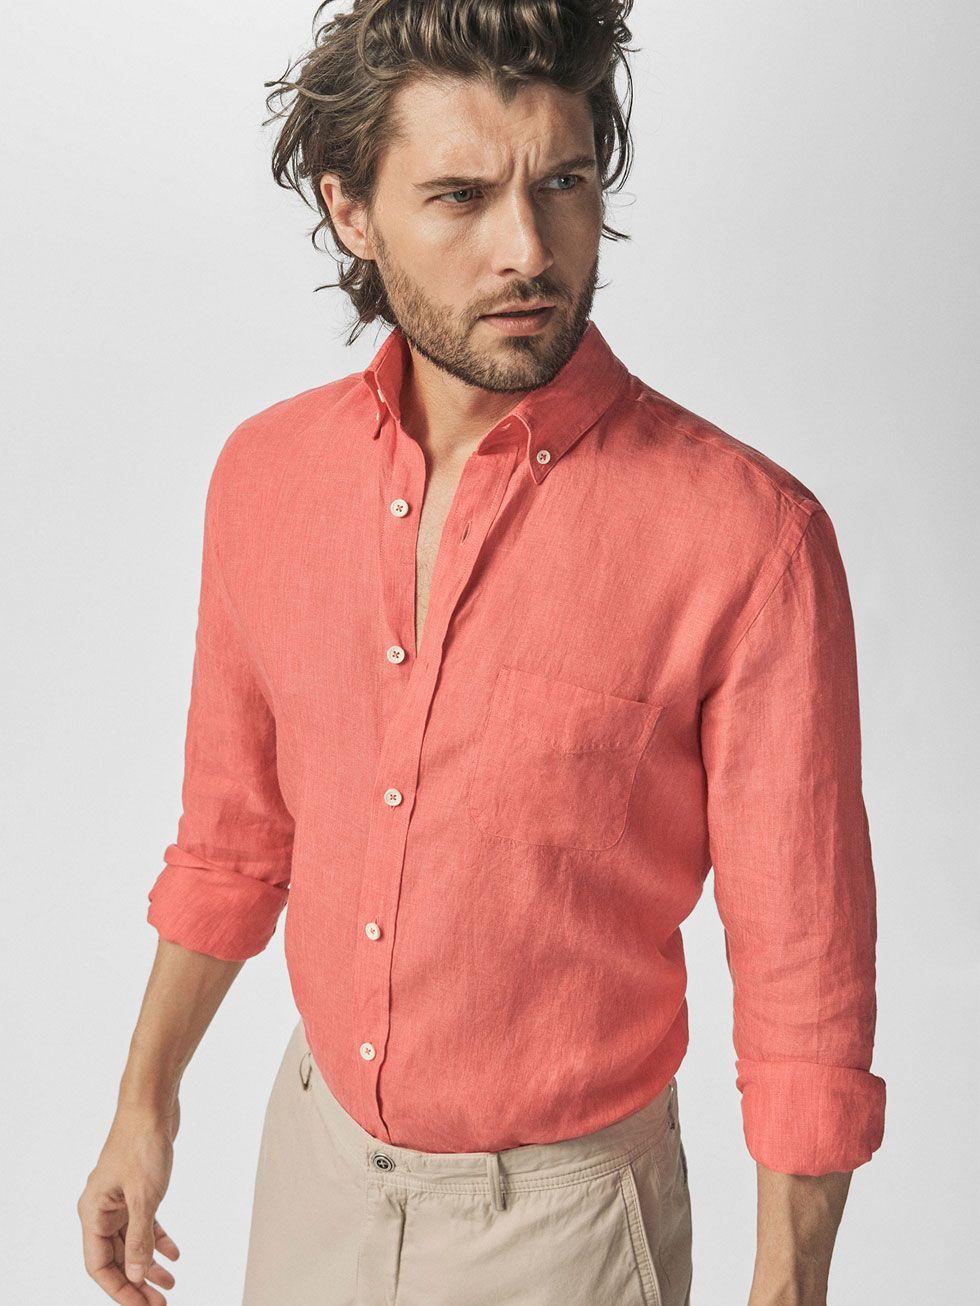 bccdd349ea5a7 CAMISA LISA LINO CASUAL FIT de HOMBRE - Camisas Casual - Ver todo de Massimo  Dutti de Primavera Verano 2017 por 39.95 - 49.95. ¡Elegancia natural!